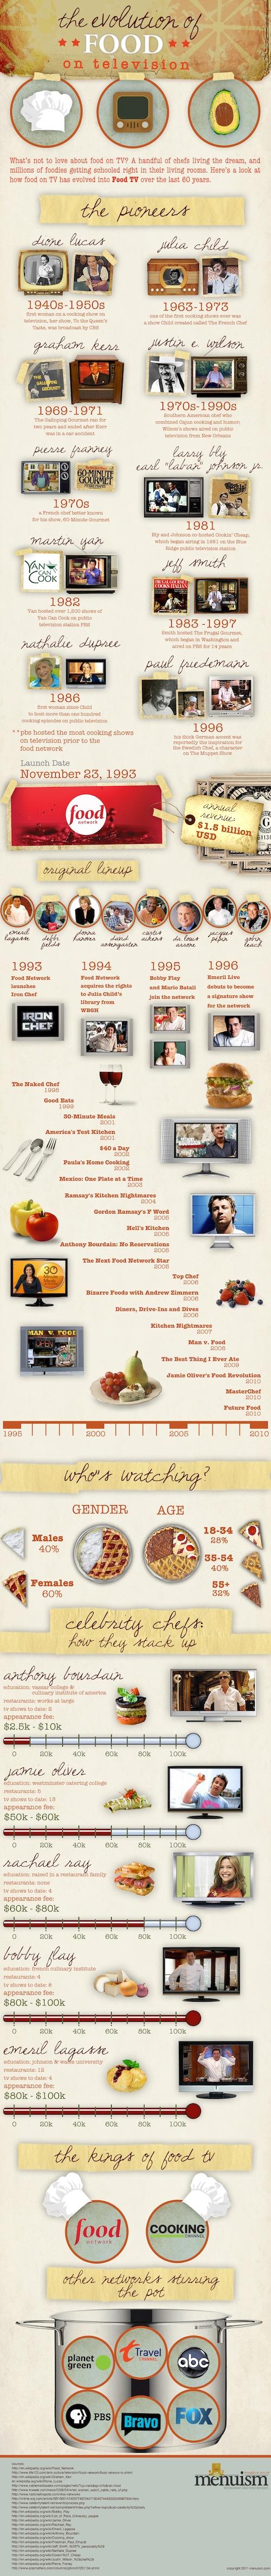 2012-01-17-menuismevolutionoffoodontv.jpeg